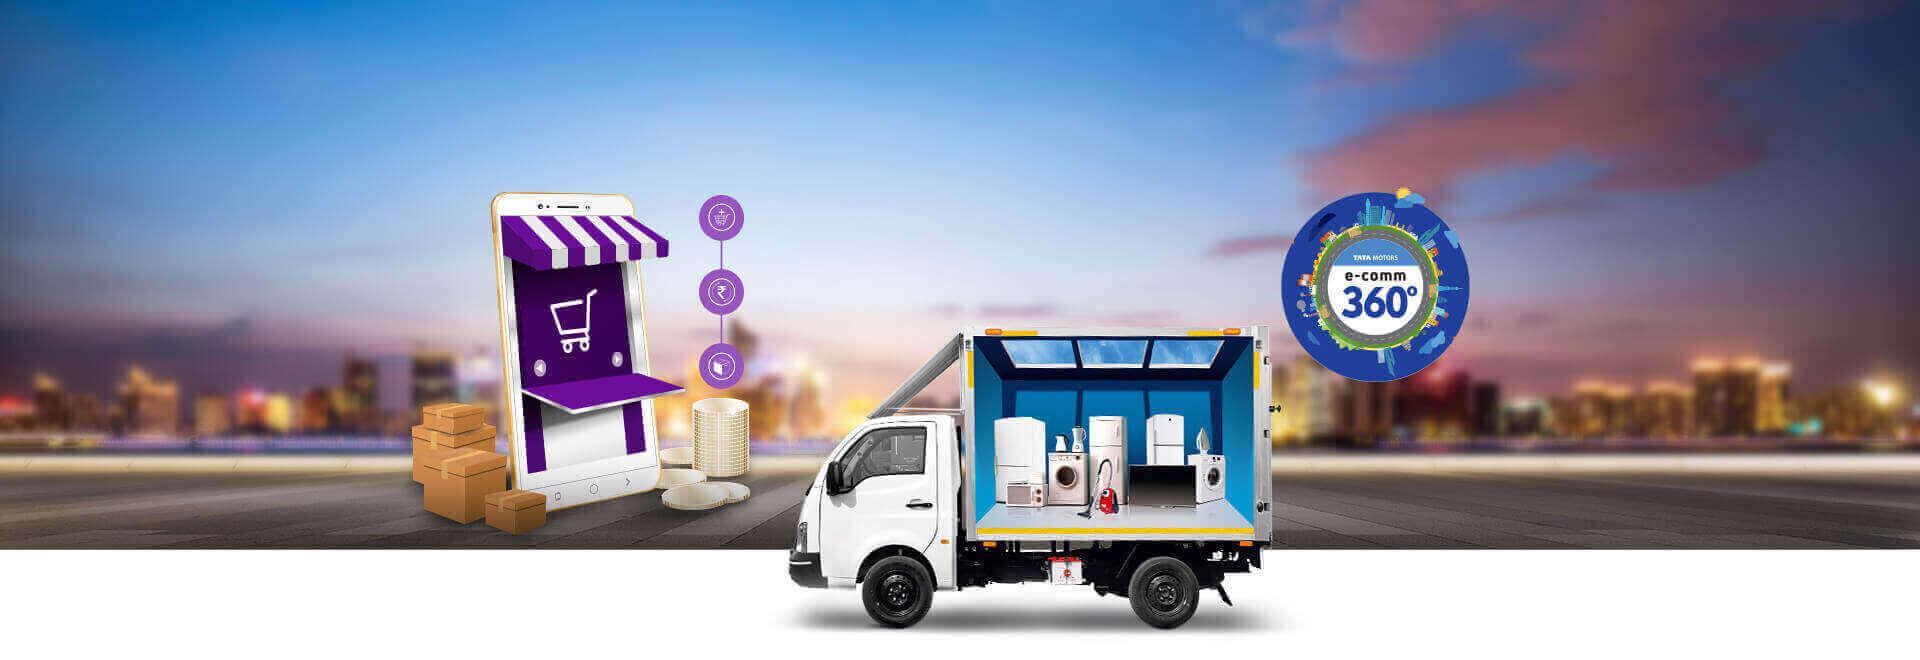 Tata Ace E-commerce Container